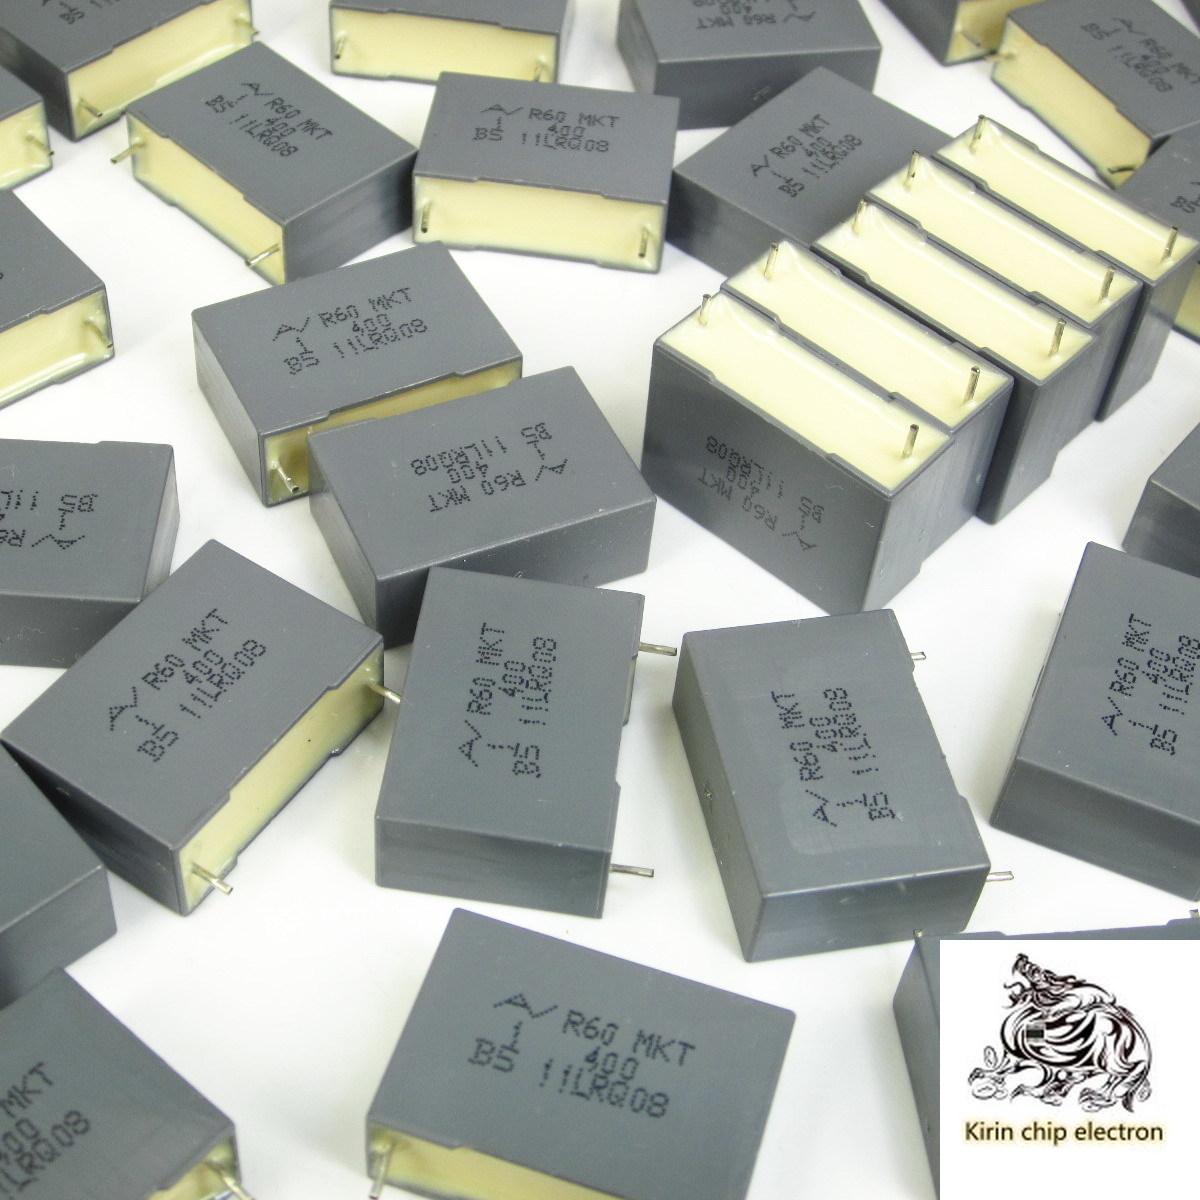 50pcs / lot brand new R60 MKT 1uf400v DC film capacitor 105 pin pitch 22.5MM